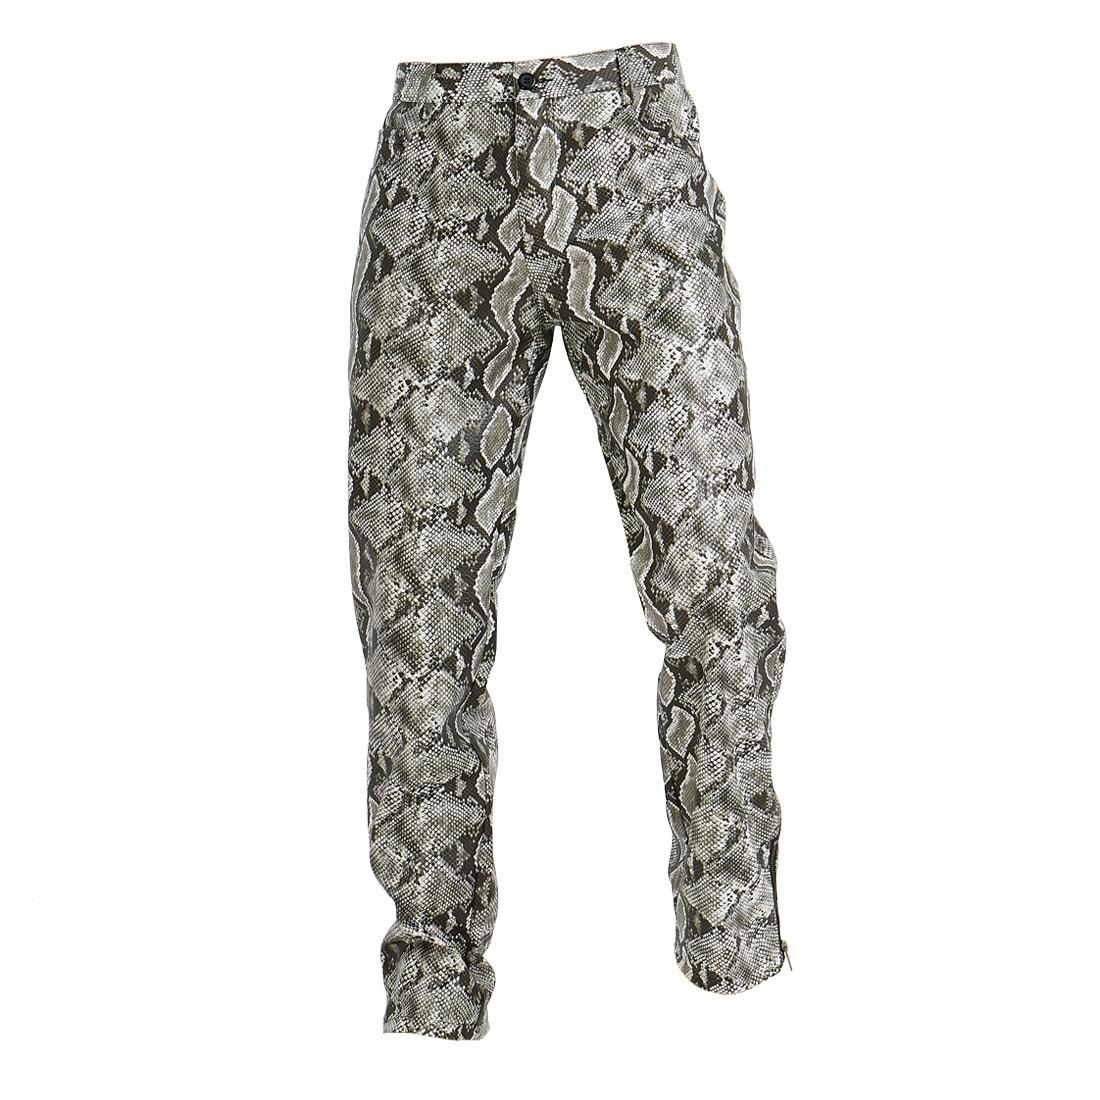 Casual Pants Men's Trousers Snake Pattern PU Leather Tide Men's Pants Slim Fit Leisure Zip Design New